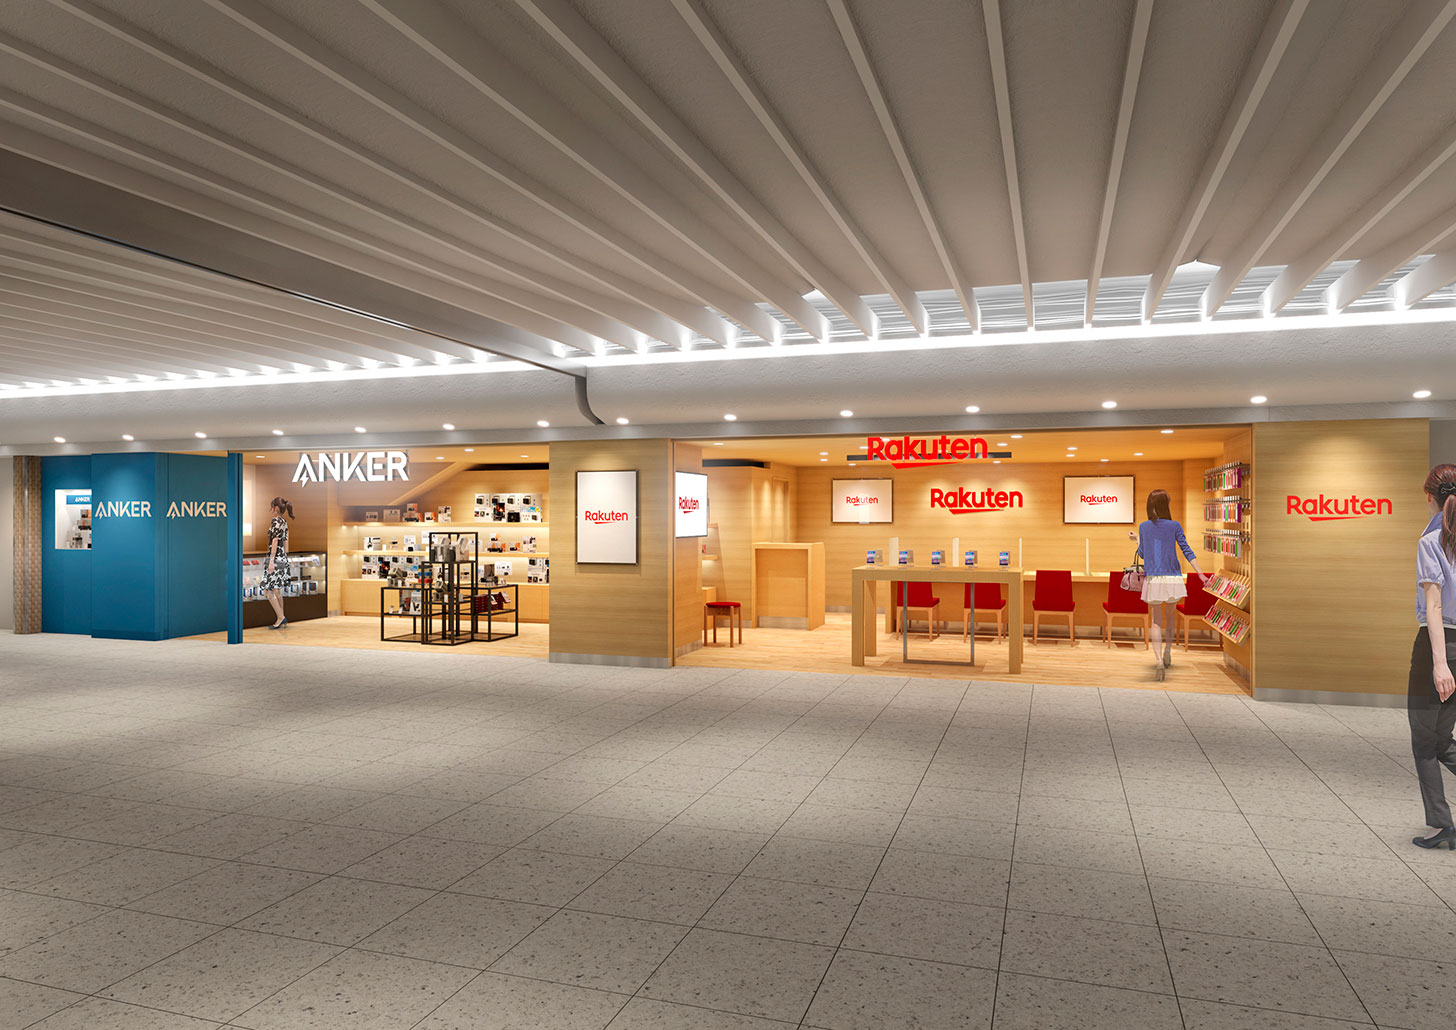 Anker Store 横浜ジョイナス、横浜駅にオープン!神奈川県内初の常設直営店